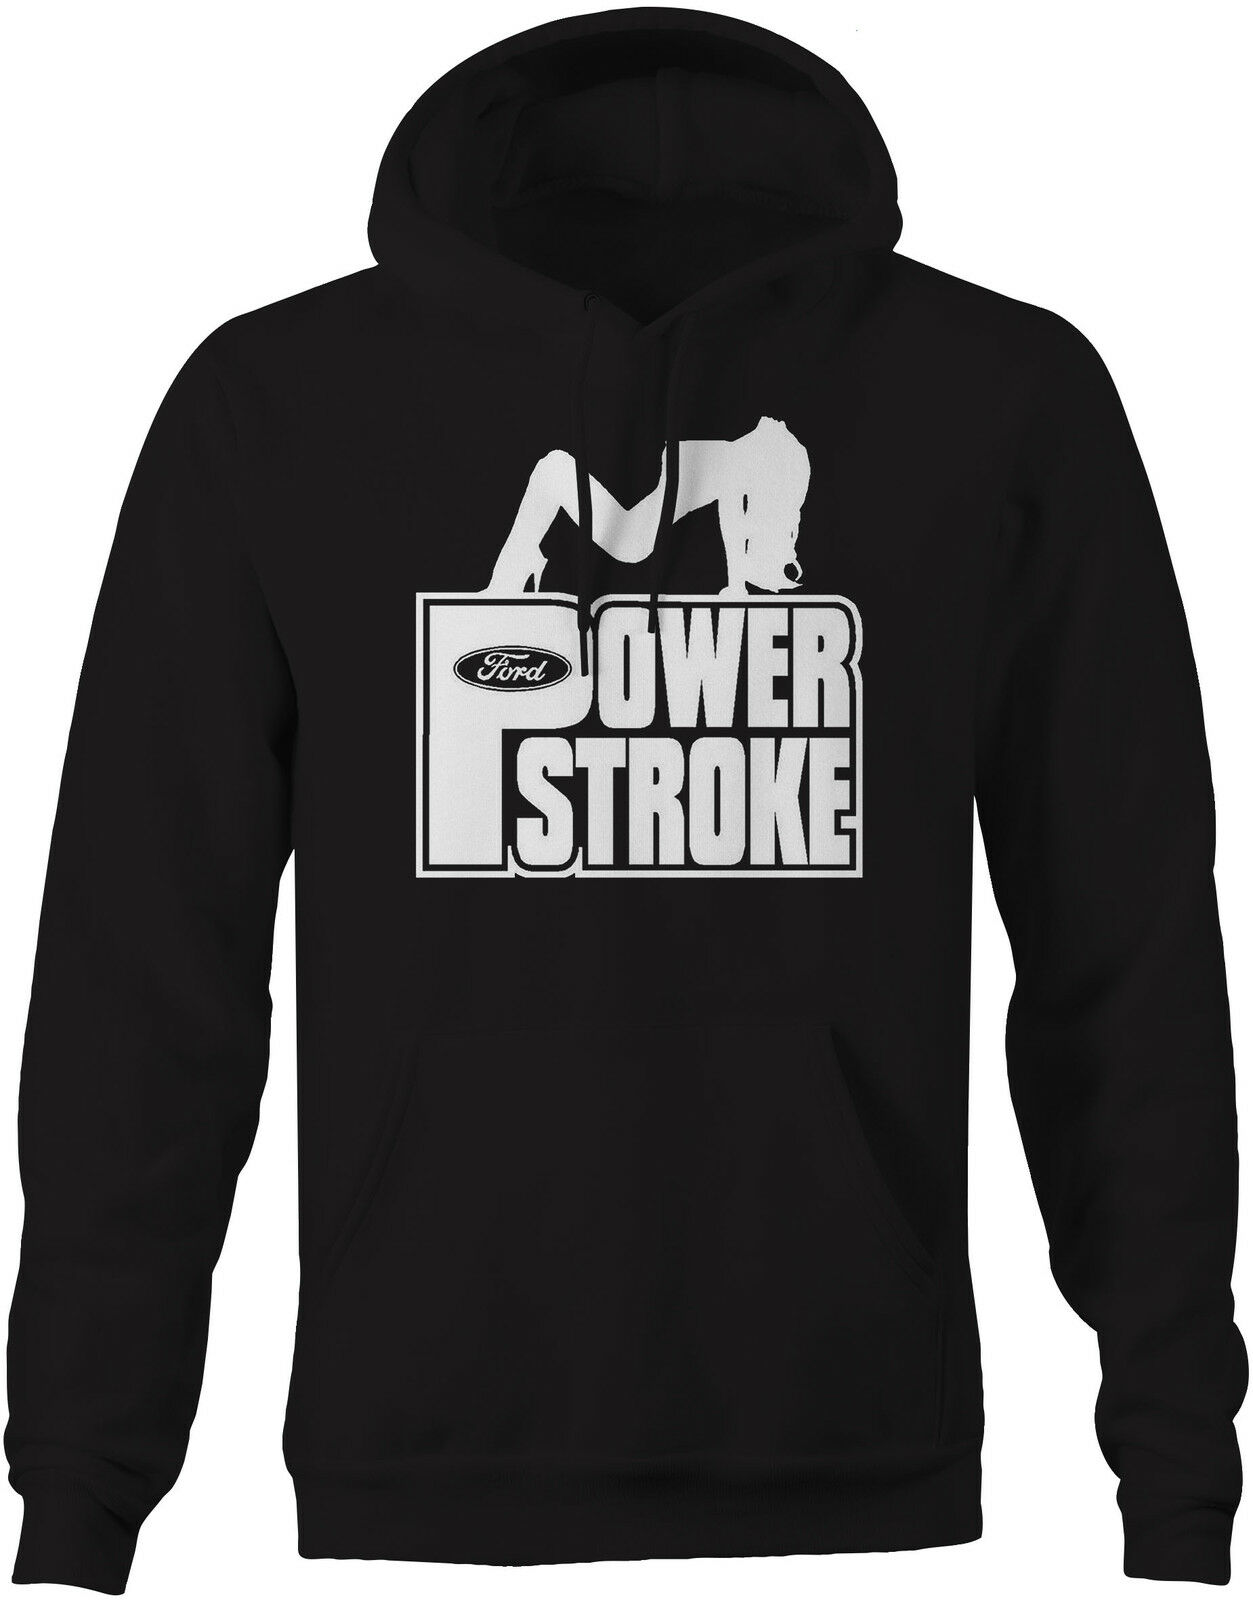 Sweatshirt -Powerstroke Diesel Sexy Girl Pose Ford F-Series